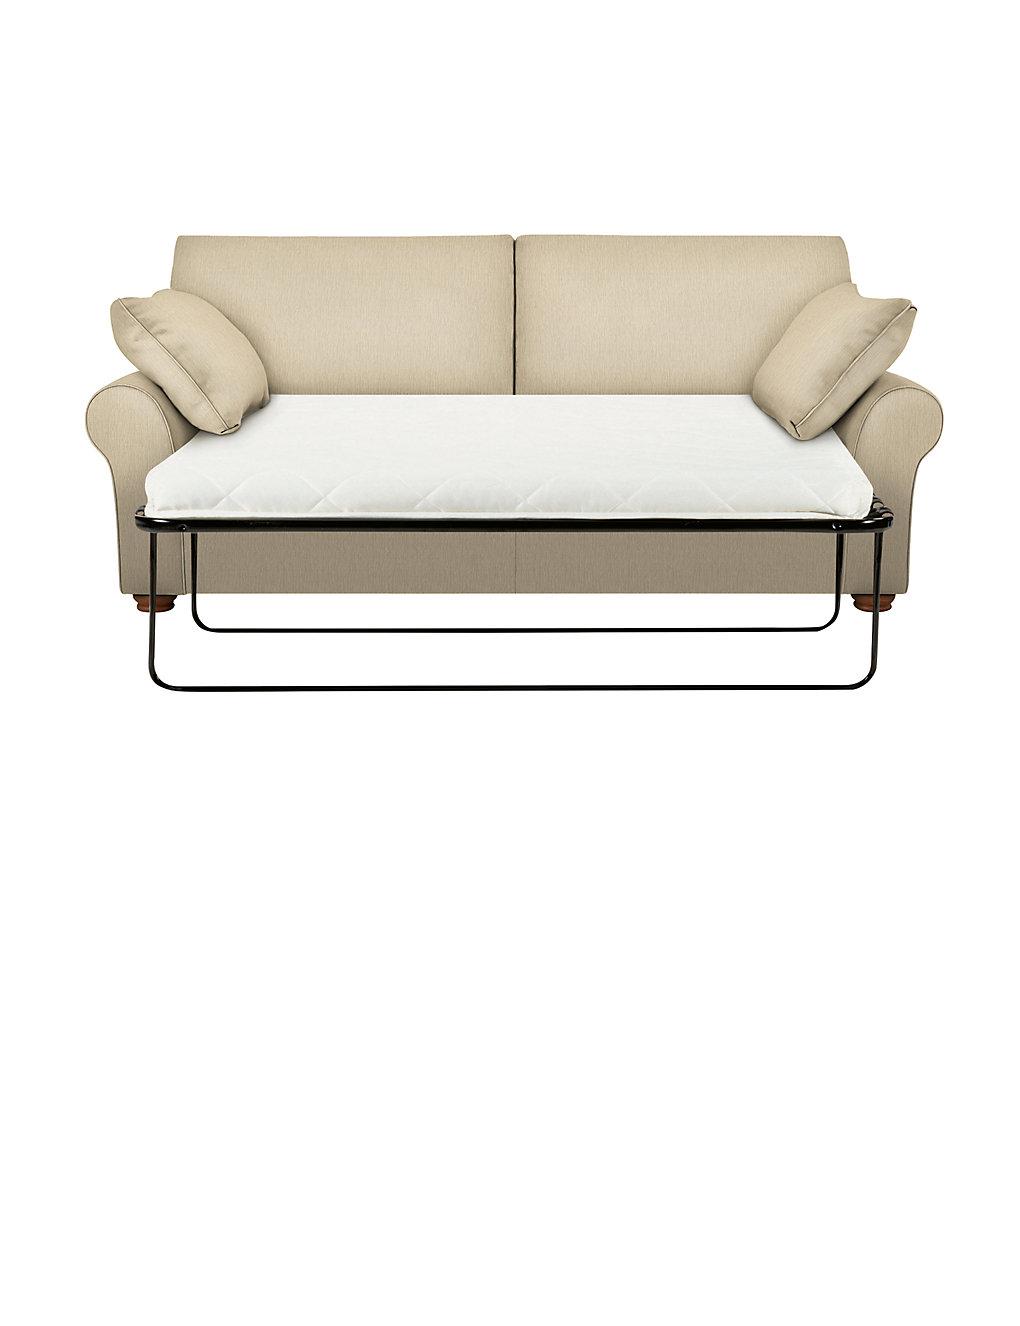 Sofa beds south australia sofa menzilperde net for Furniture adelaide